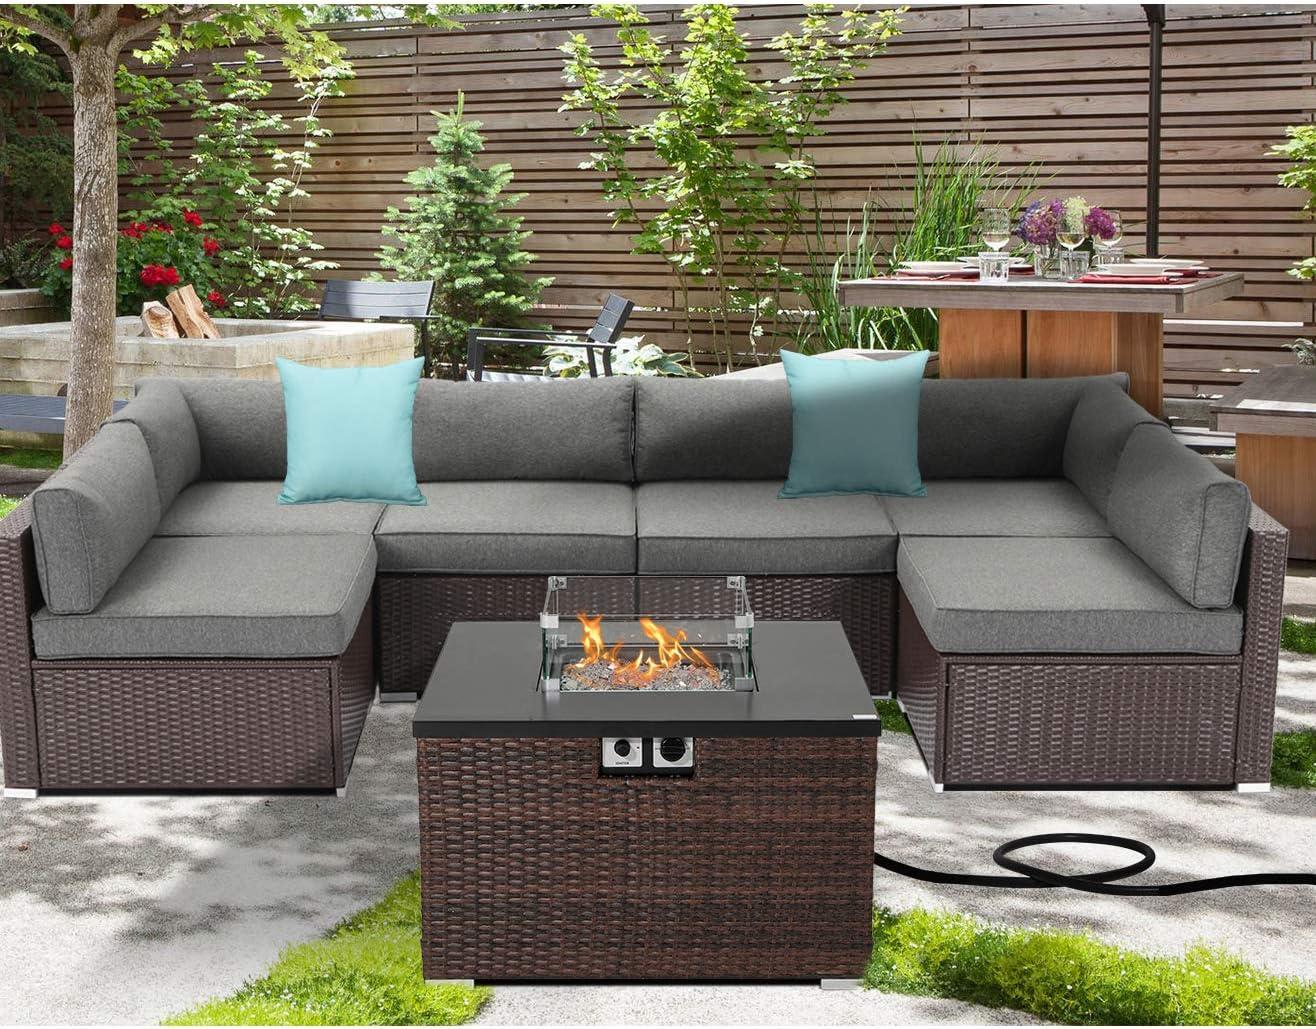 SUNBURY Outdoor 7 Piece Sectional Sofa Propane Fire Pit, Dark Brown Patio Furniture Set w 32-inch 40,000 BTU Square Wicker Fire Table Tank 20 gal Outside for Garden, Poolside, Backyard